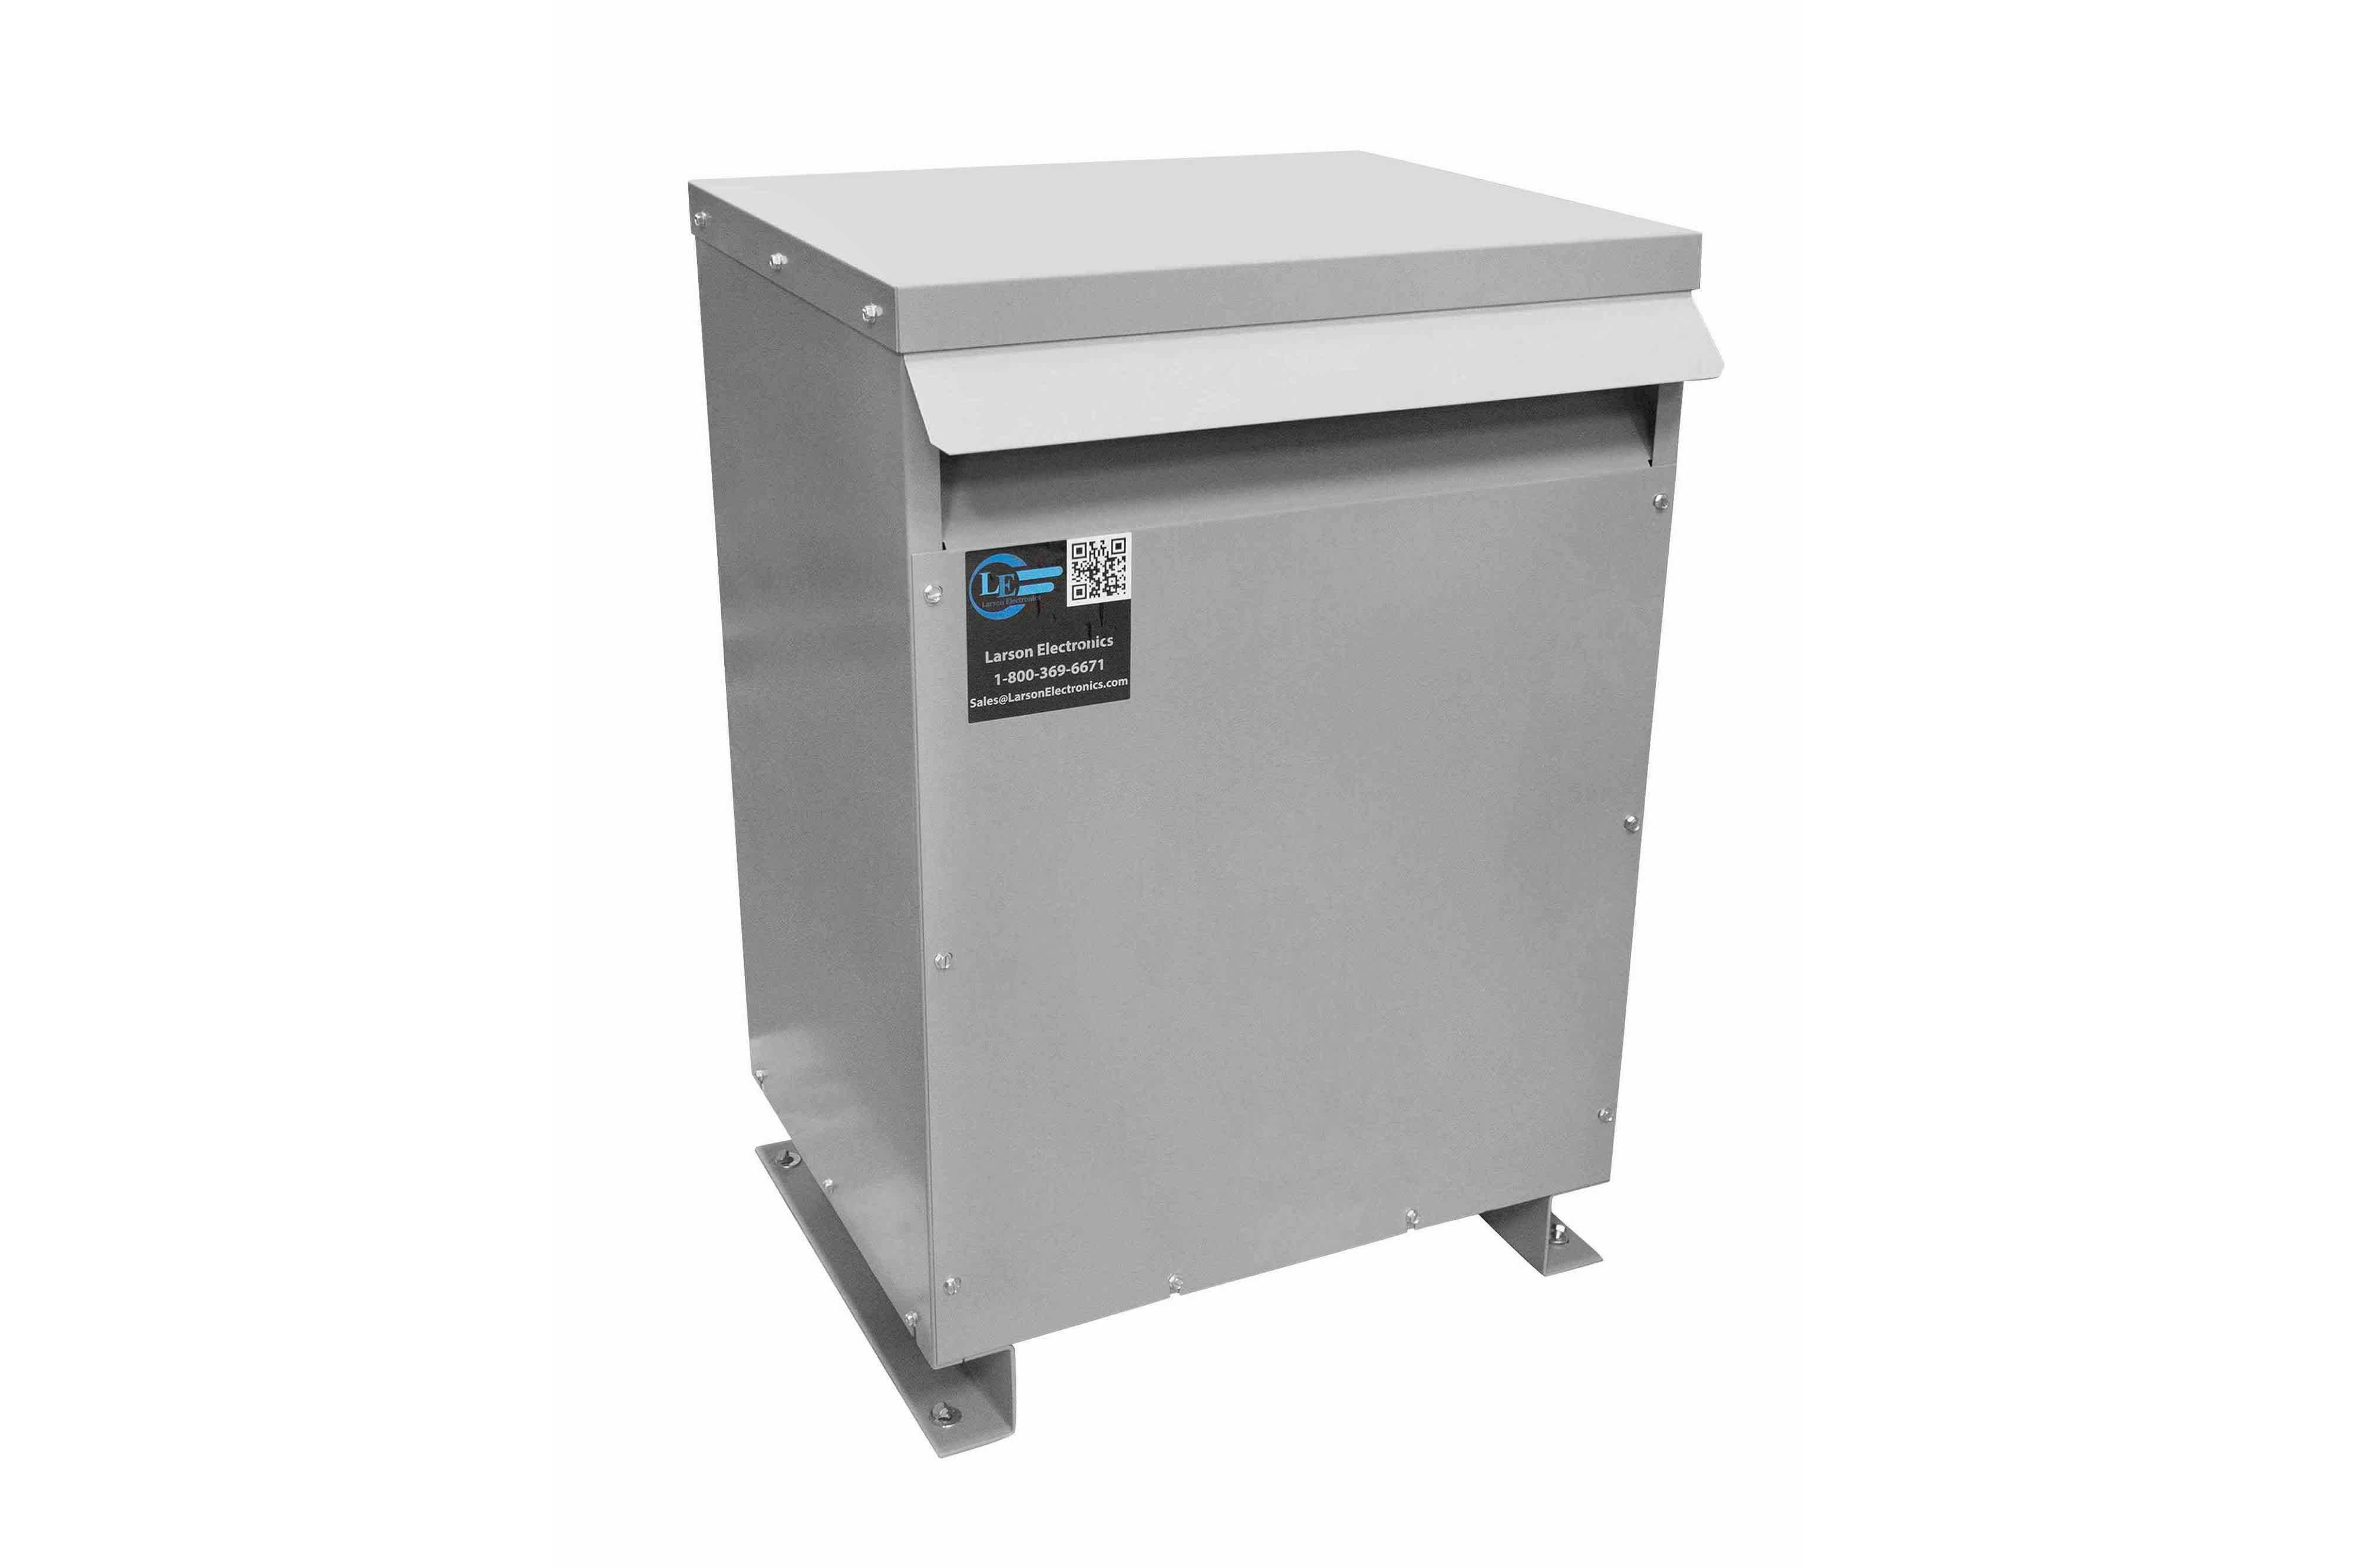 700 kVA 3PH Isolation Transformer, 460V Wye Primary, 240V Delta Secondary, N3R, Ventilated, 60 Hz